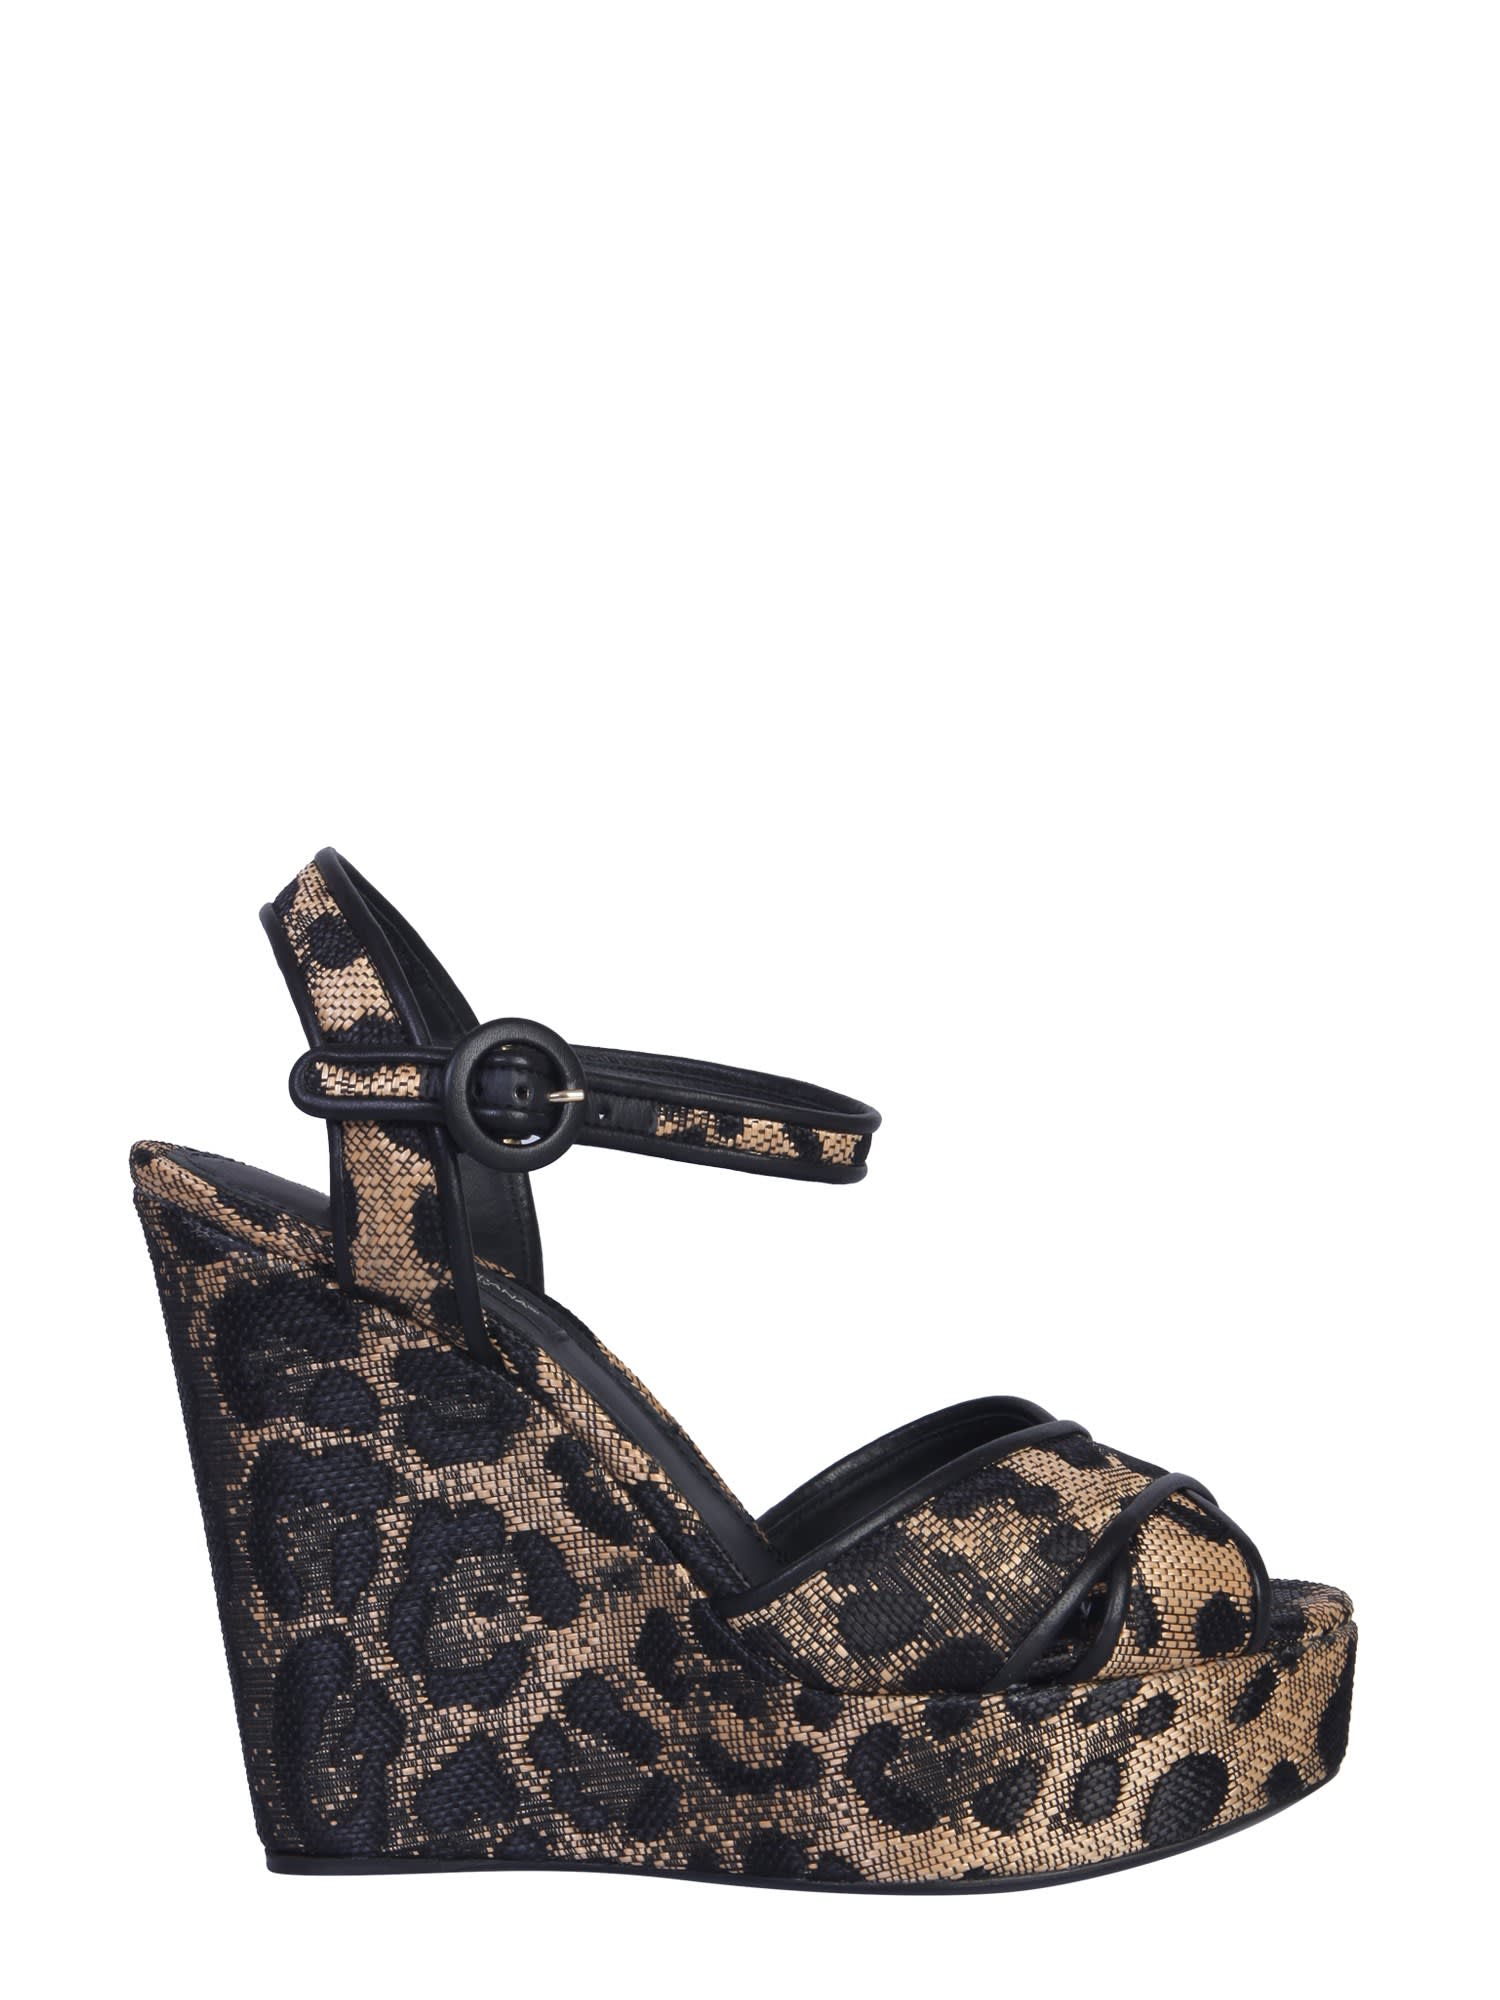 Dolce & Gabbana Animal Print Wedge Sandal